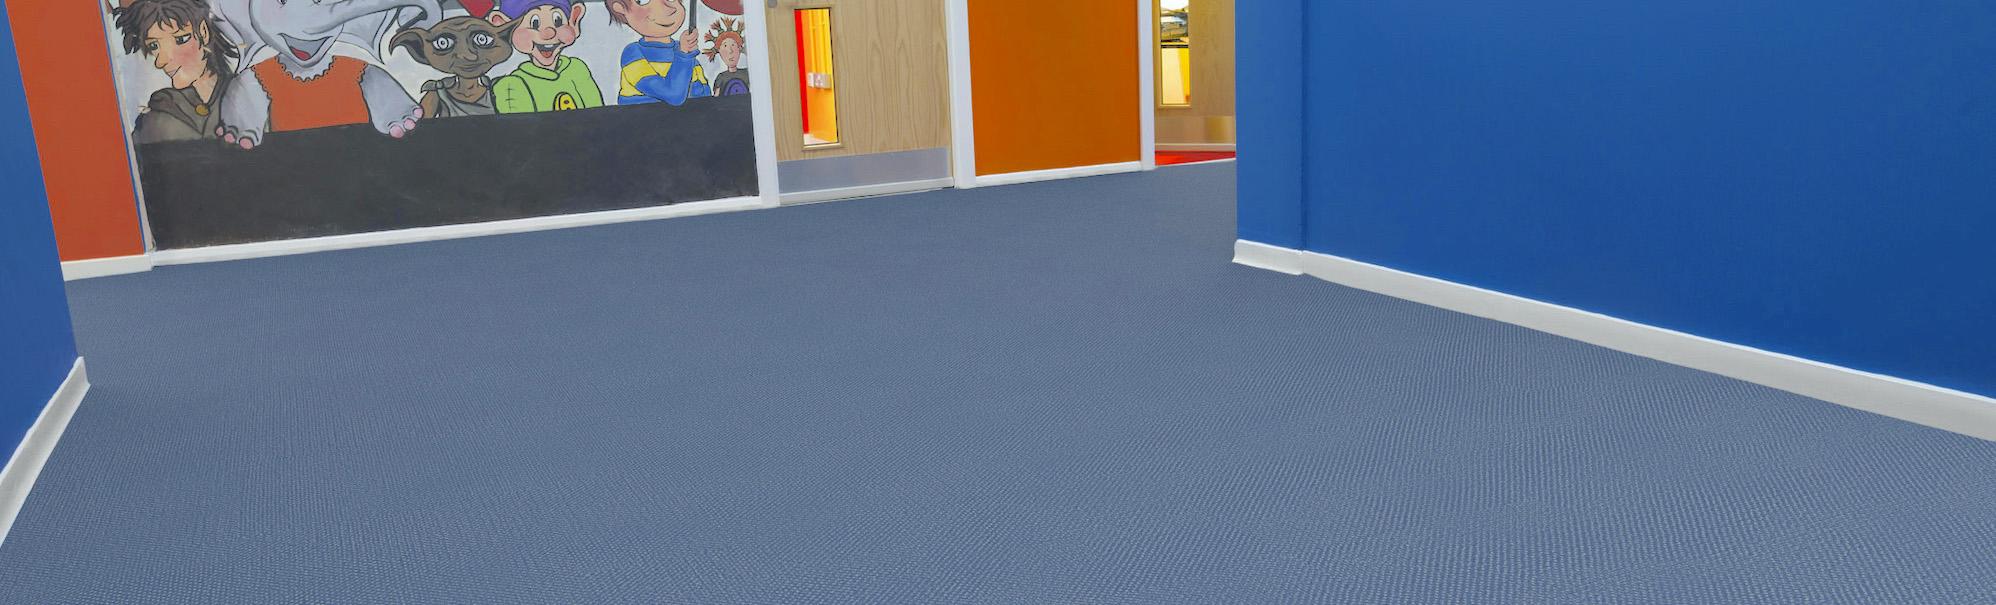 Heckmondwike | Commercial Carpet and Carpet Tiles | Montage